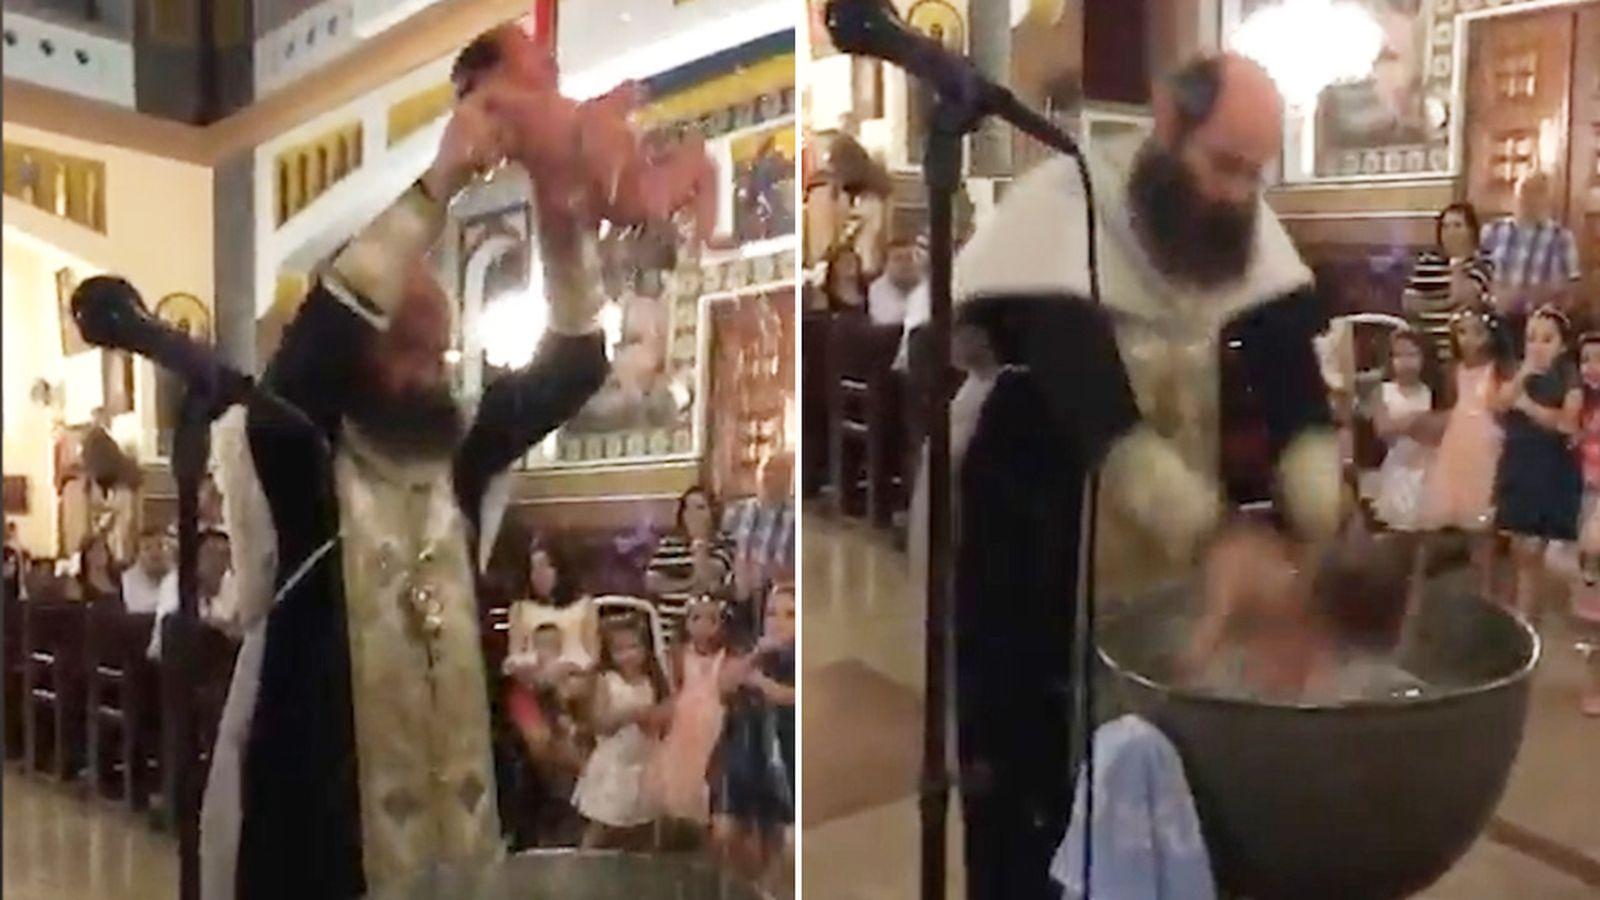 Orthodox Bishop throws baby around like a basketball during baptism